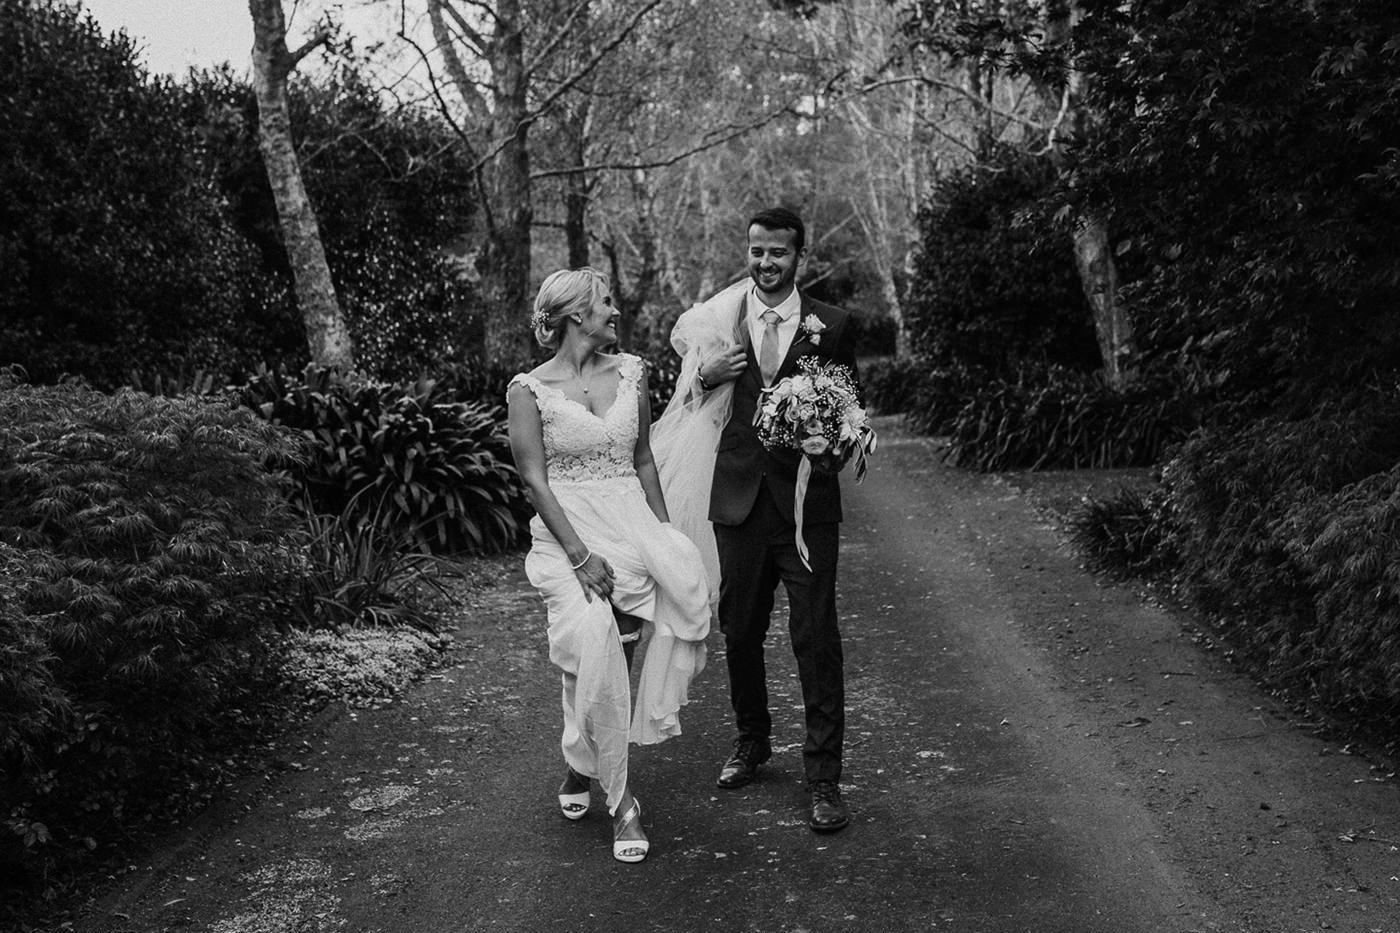 wedding_photographer_nz-00032.jpg